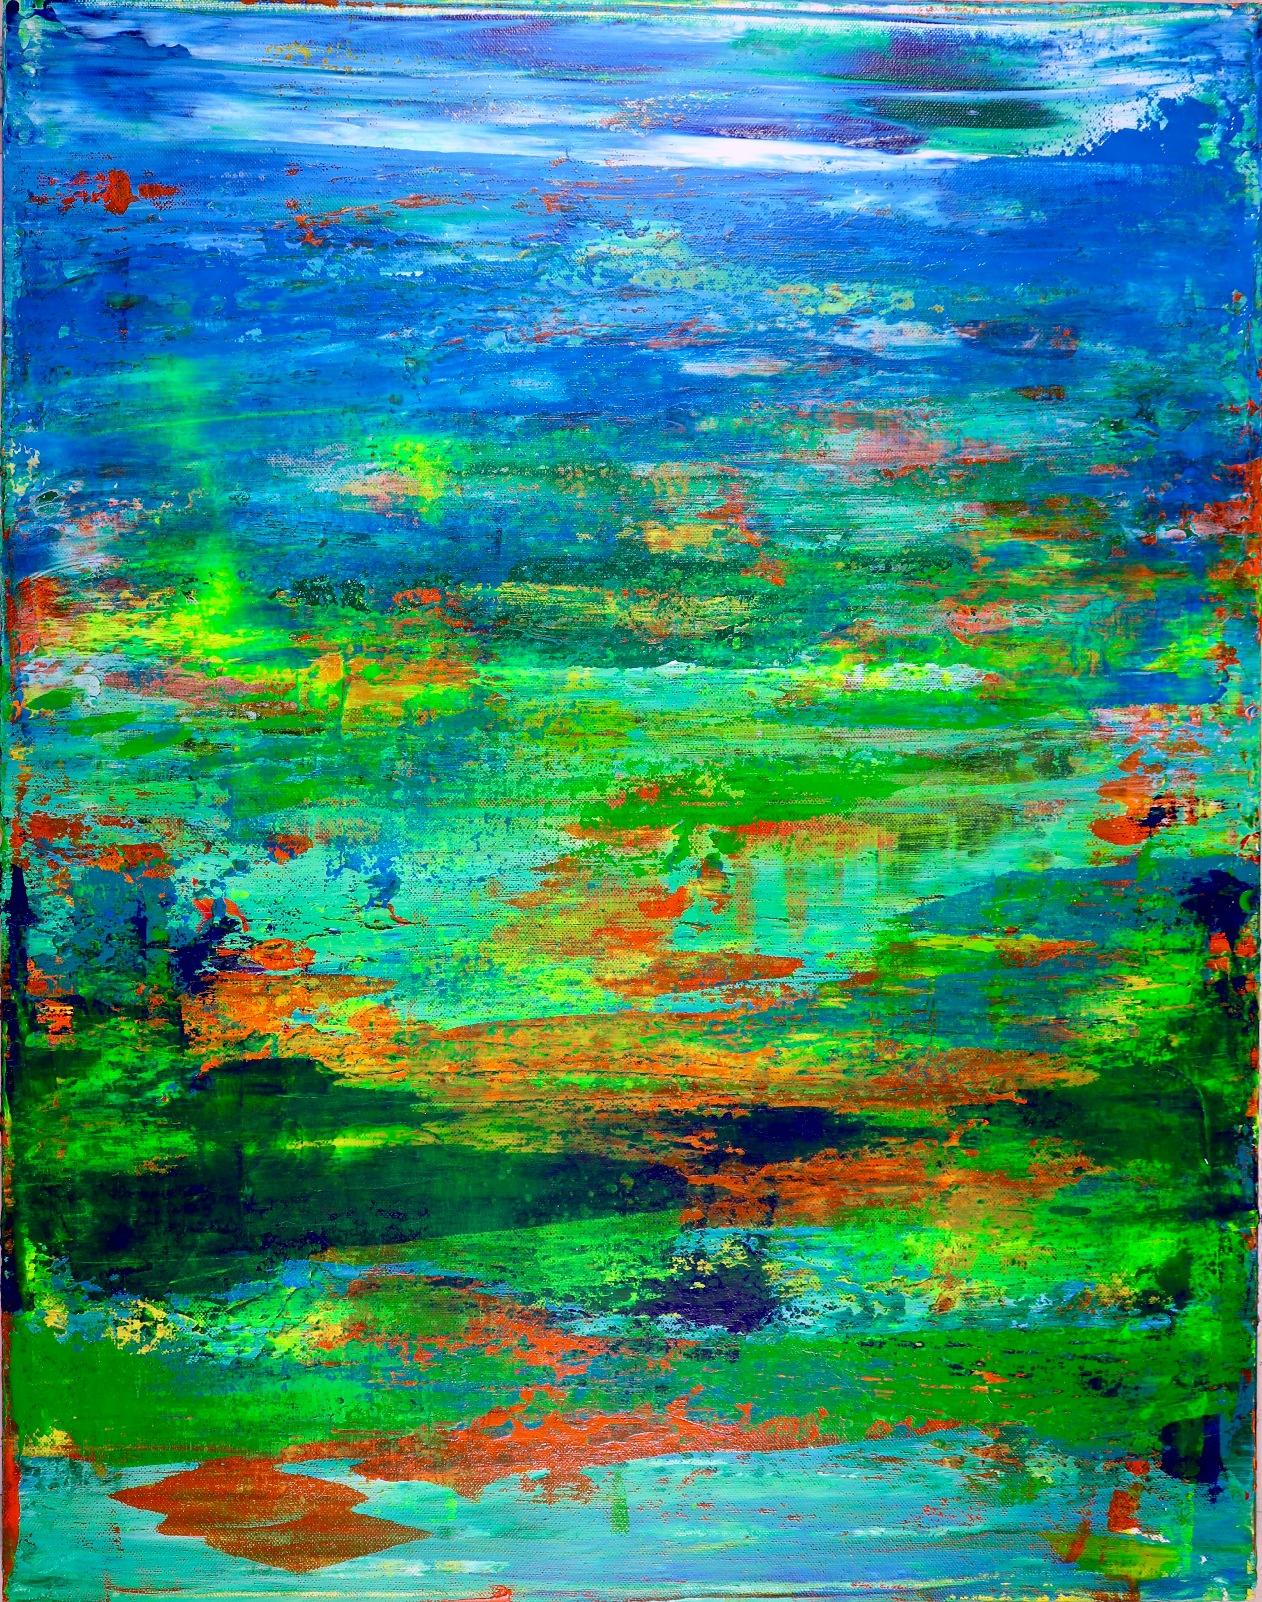 Interrupted Abstract - Nestor Toro